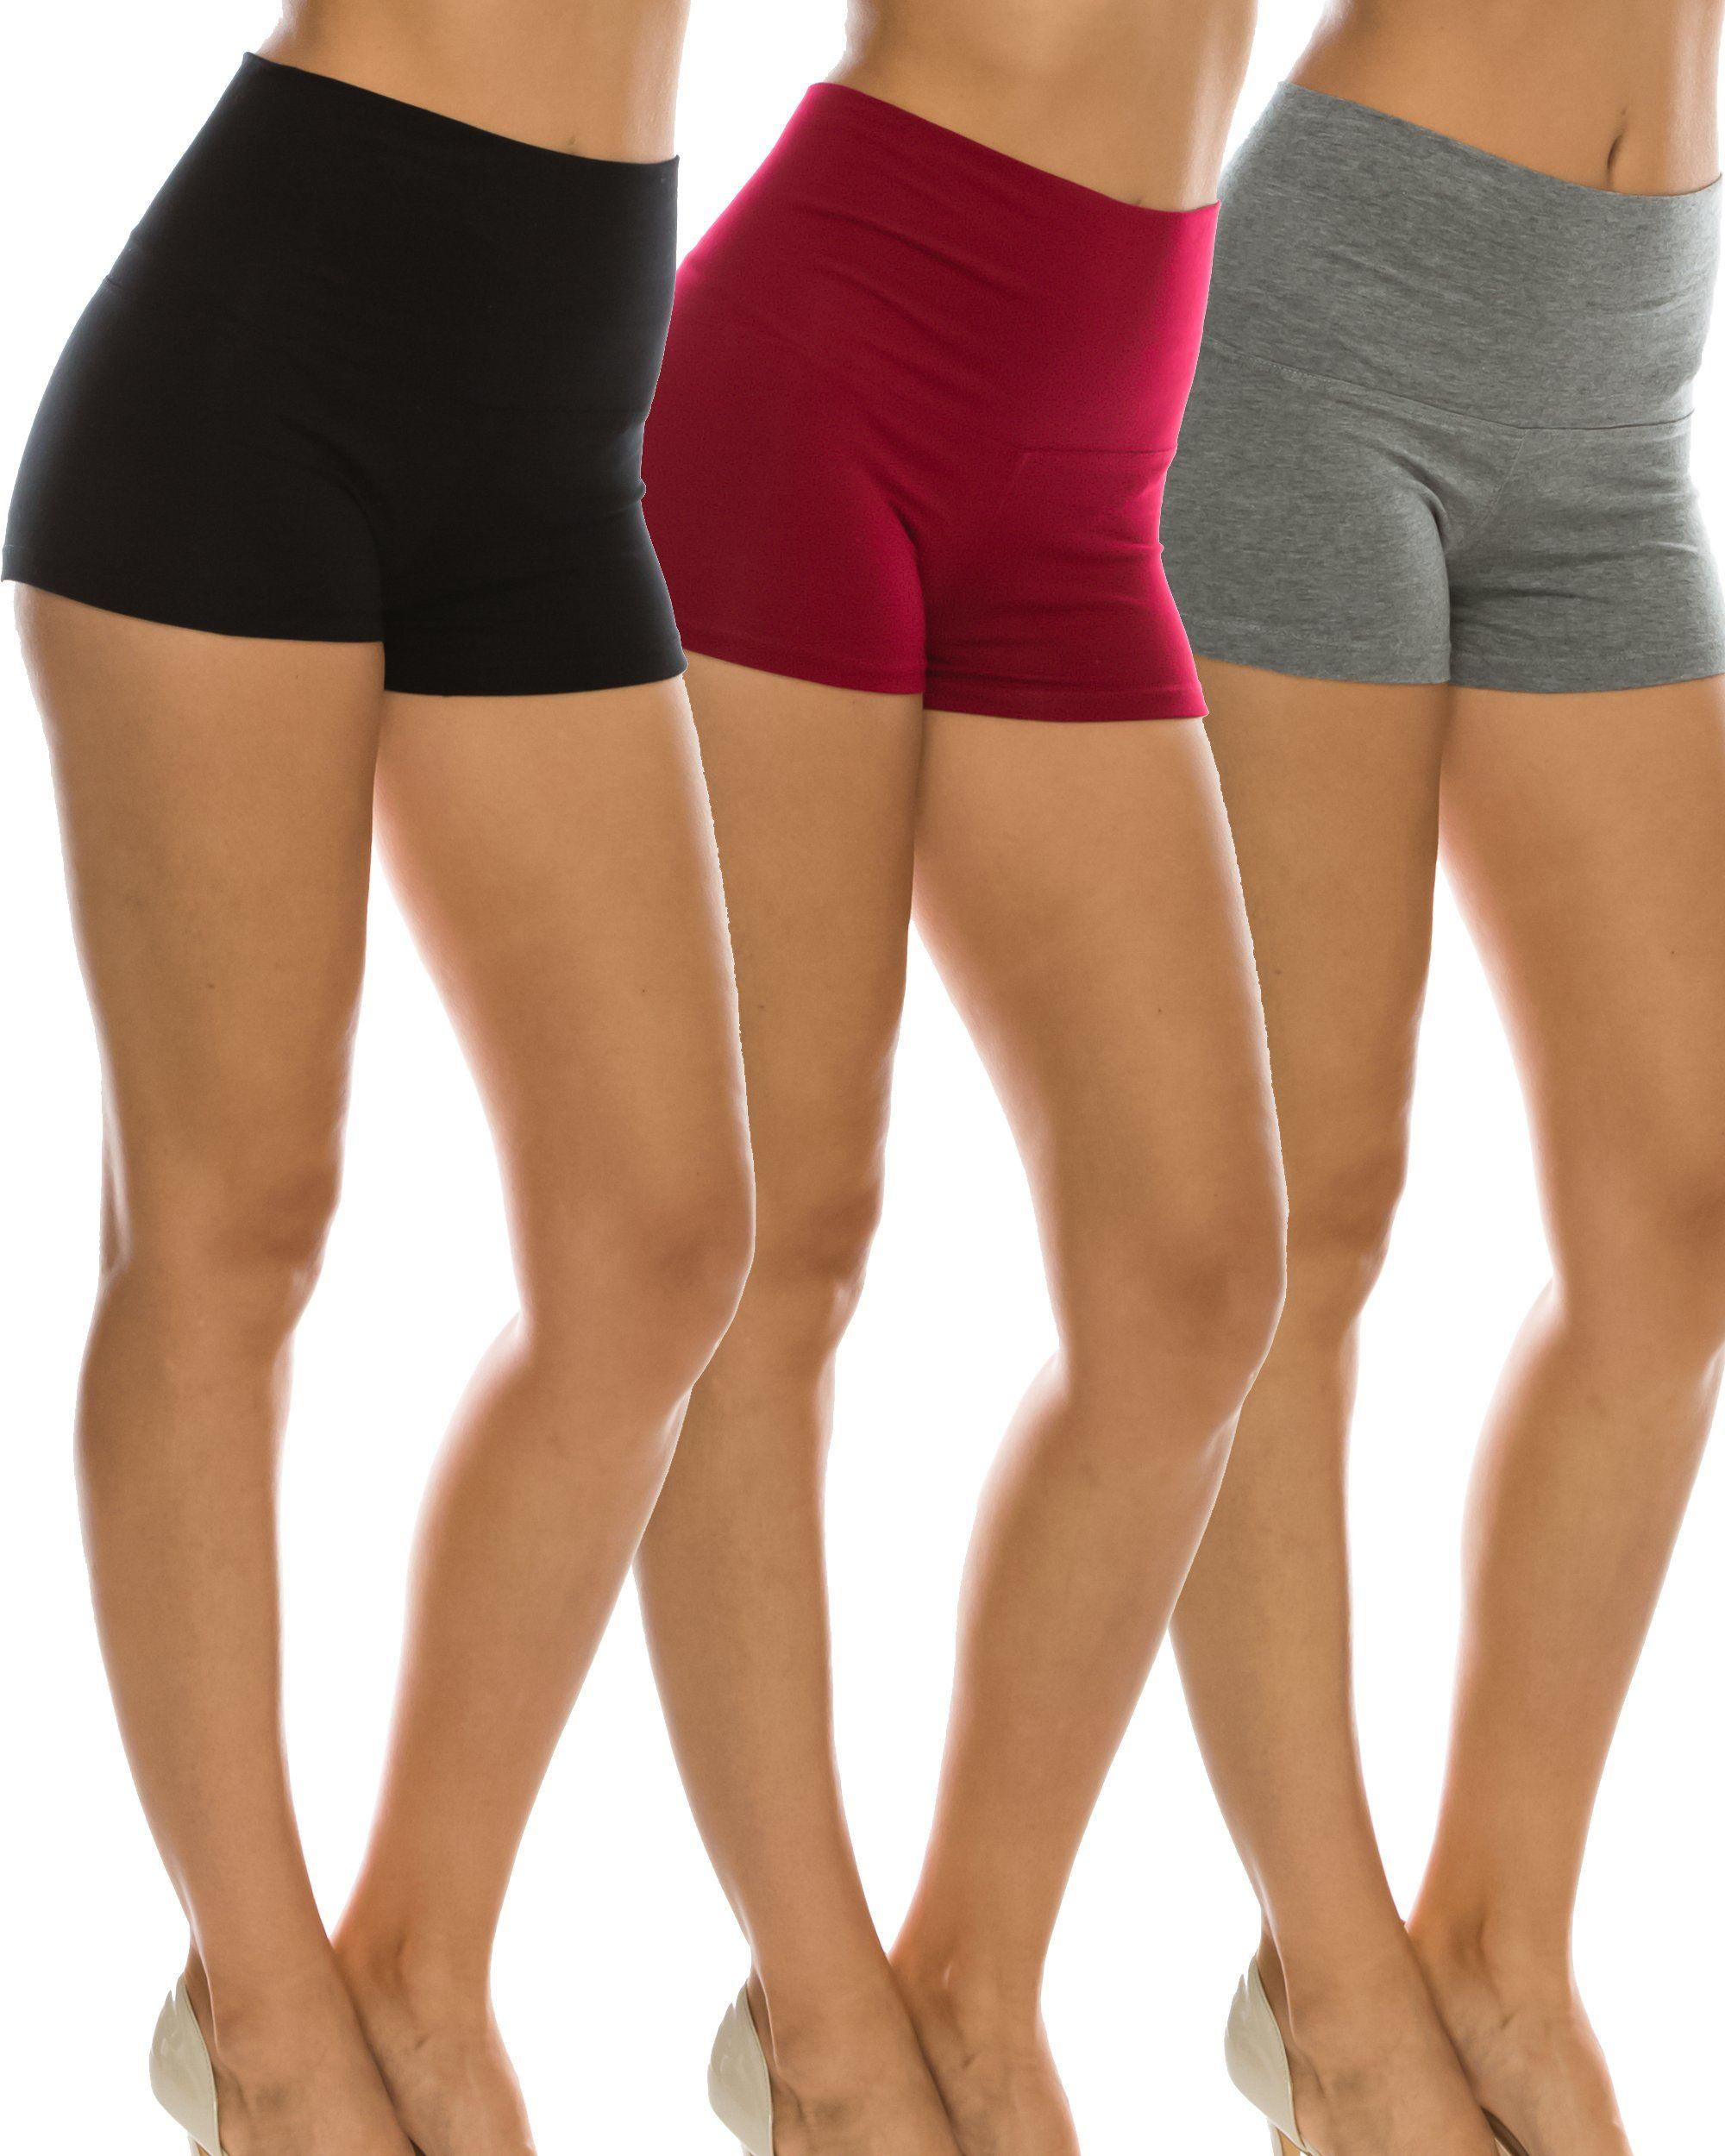 d32967a0db857  900  Nolabel 3pack Women s Activewear Fold Over Waistband Yoga Gym Workout  Hot Short Pants